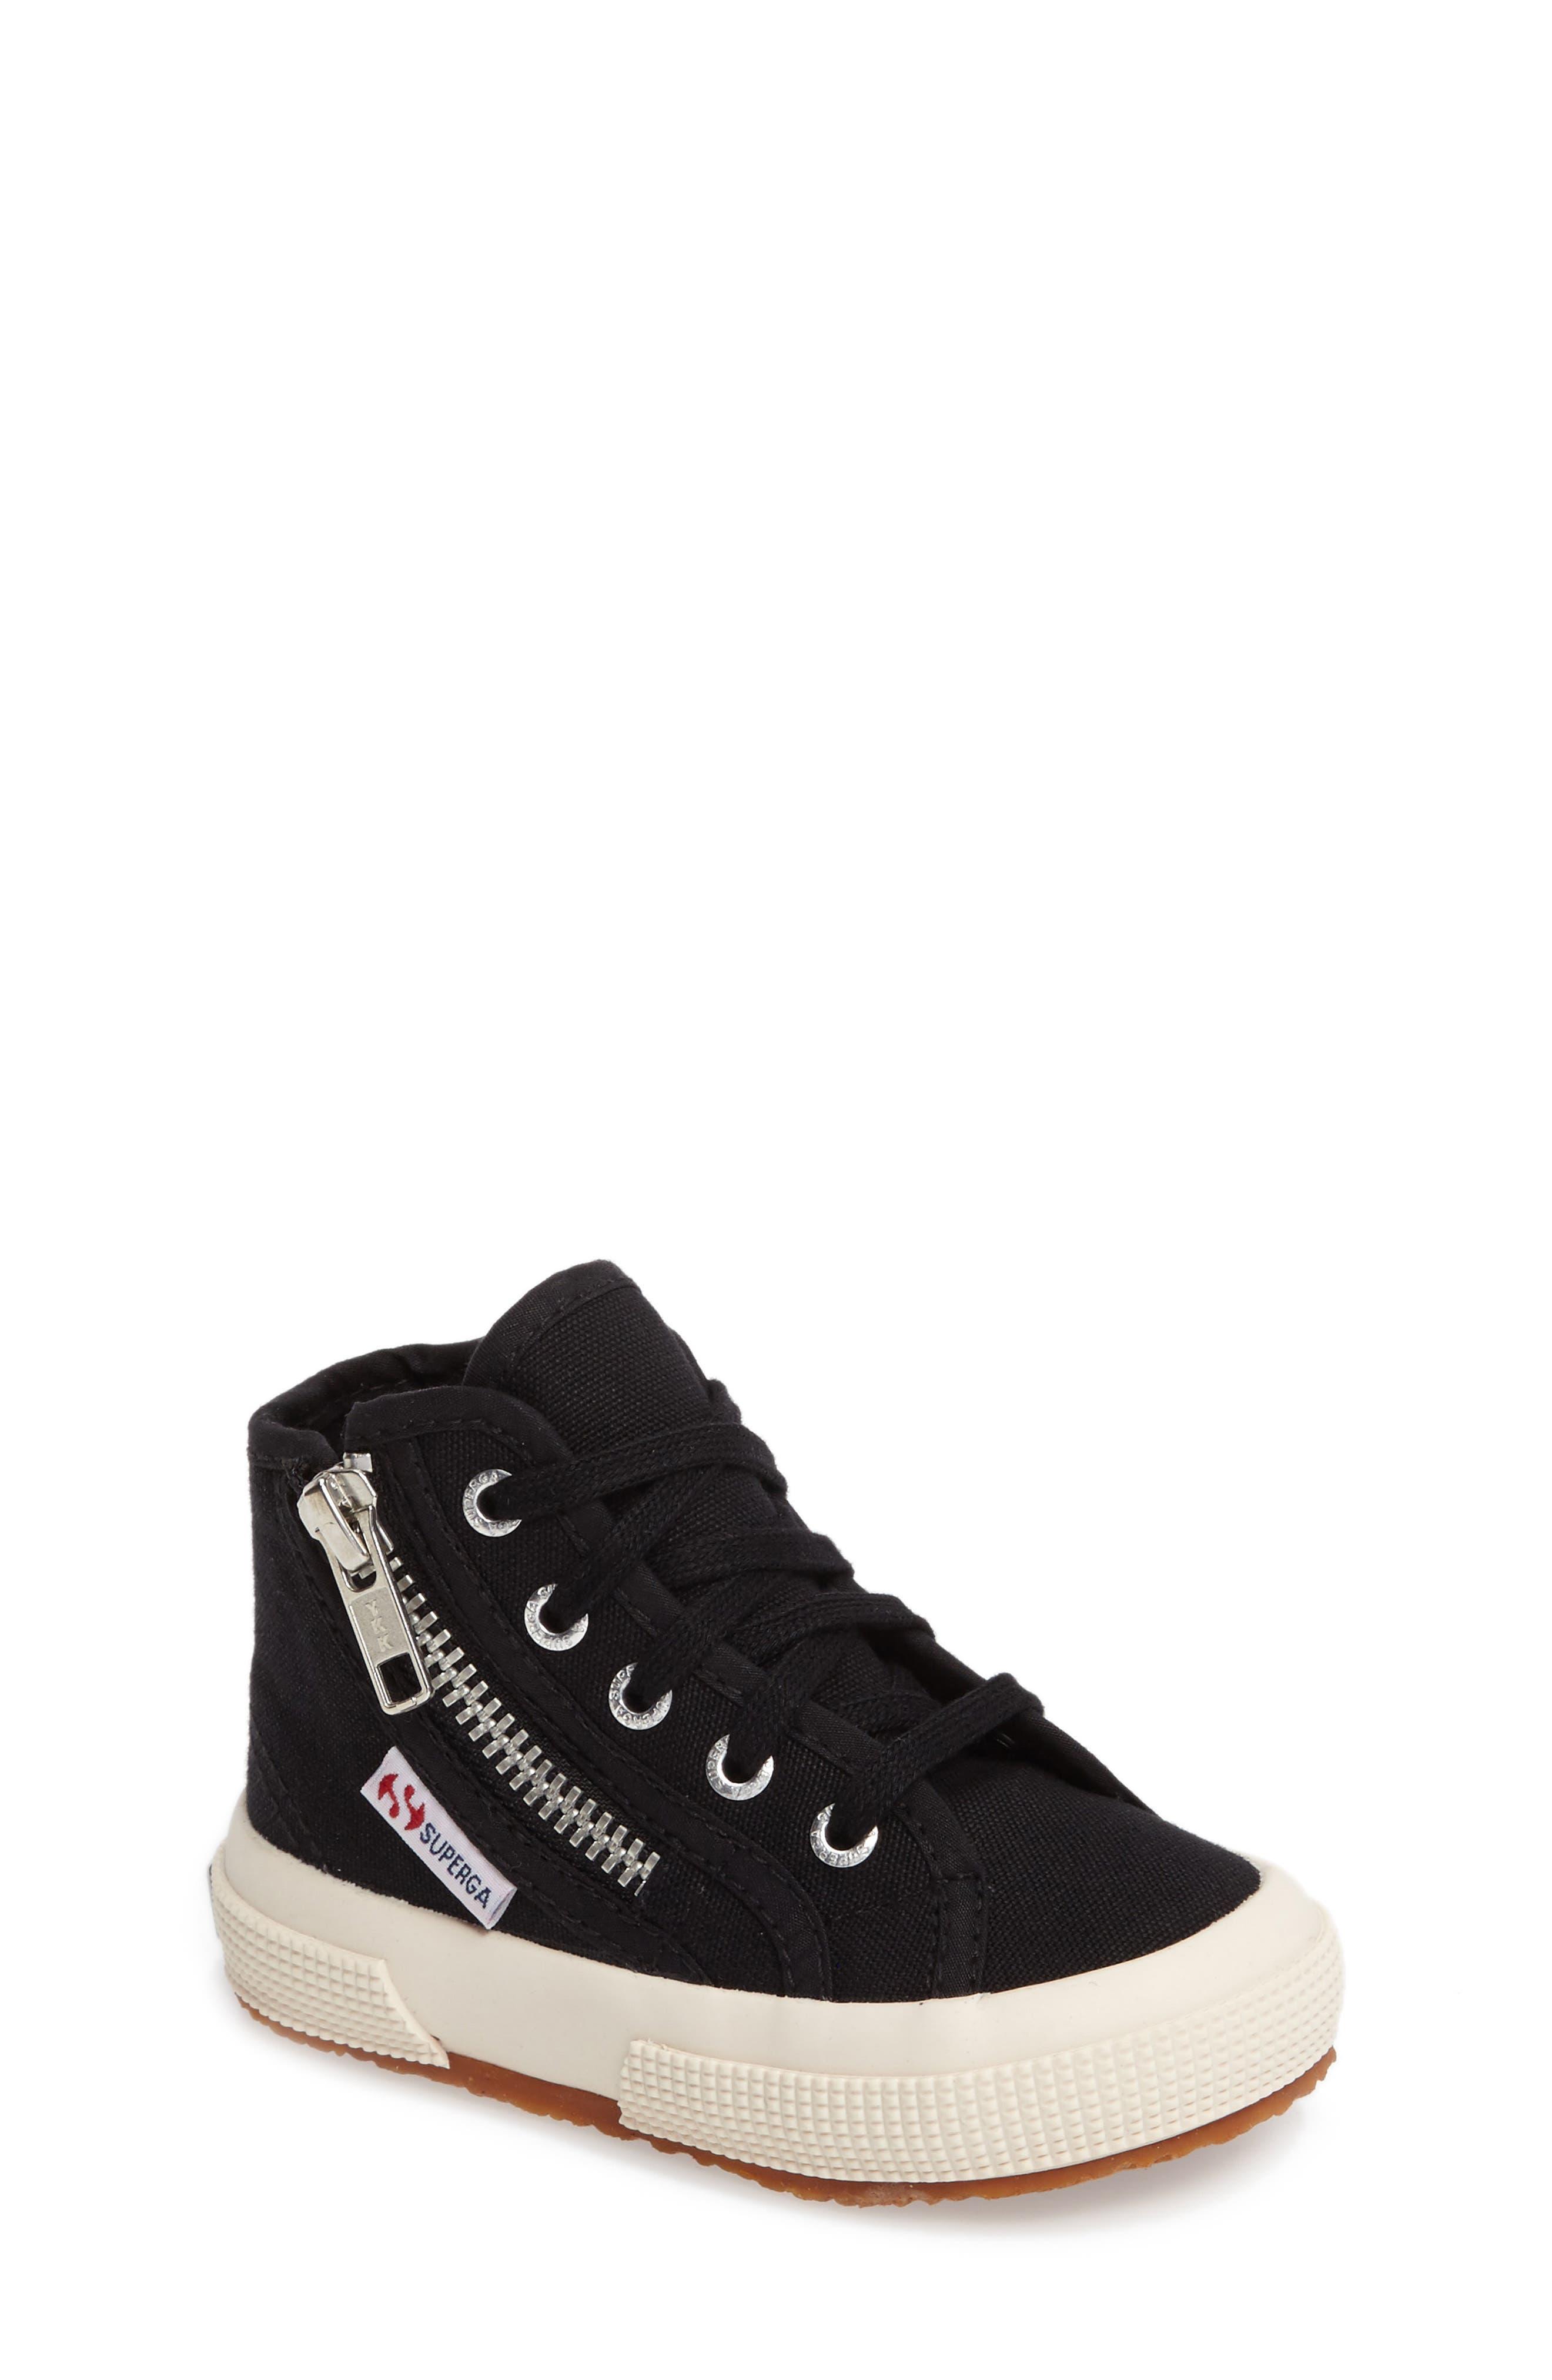 Zip High Top Sneaker,                             Main thumbnail 1, color,                             001